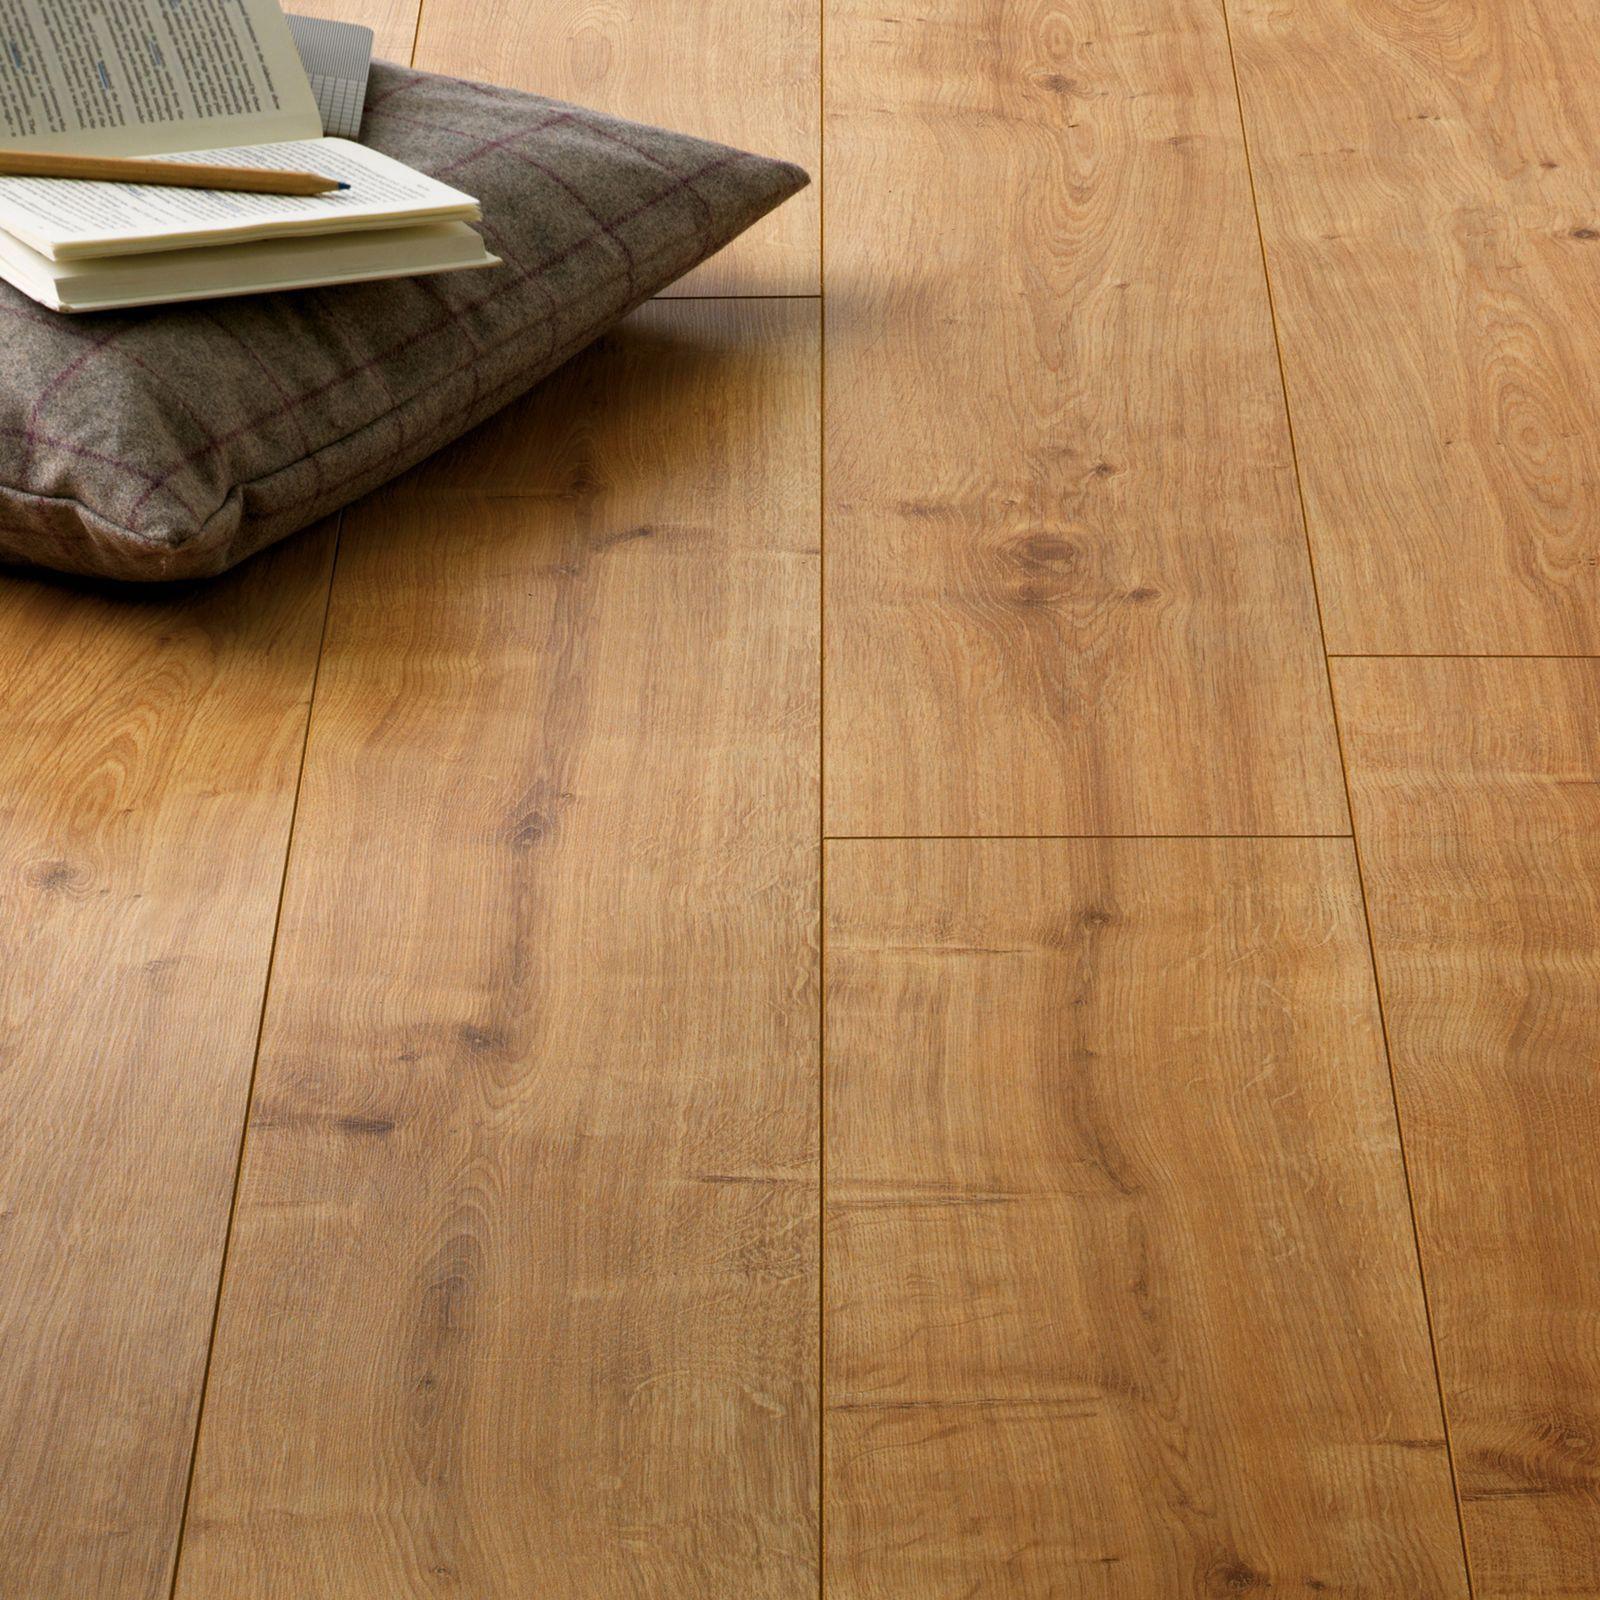 hardwood floor acclimation of warren oak laminate flooring homebase laminate flooring ideas regarding laminae warren oak laminate flooring at homebase co uk